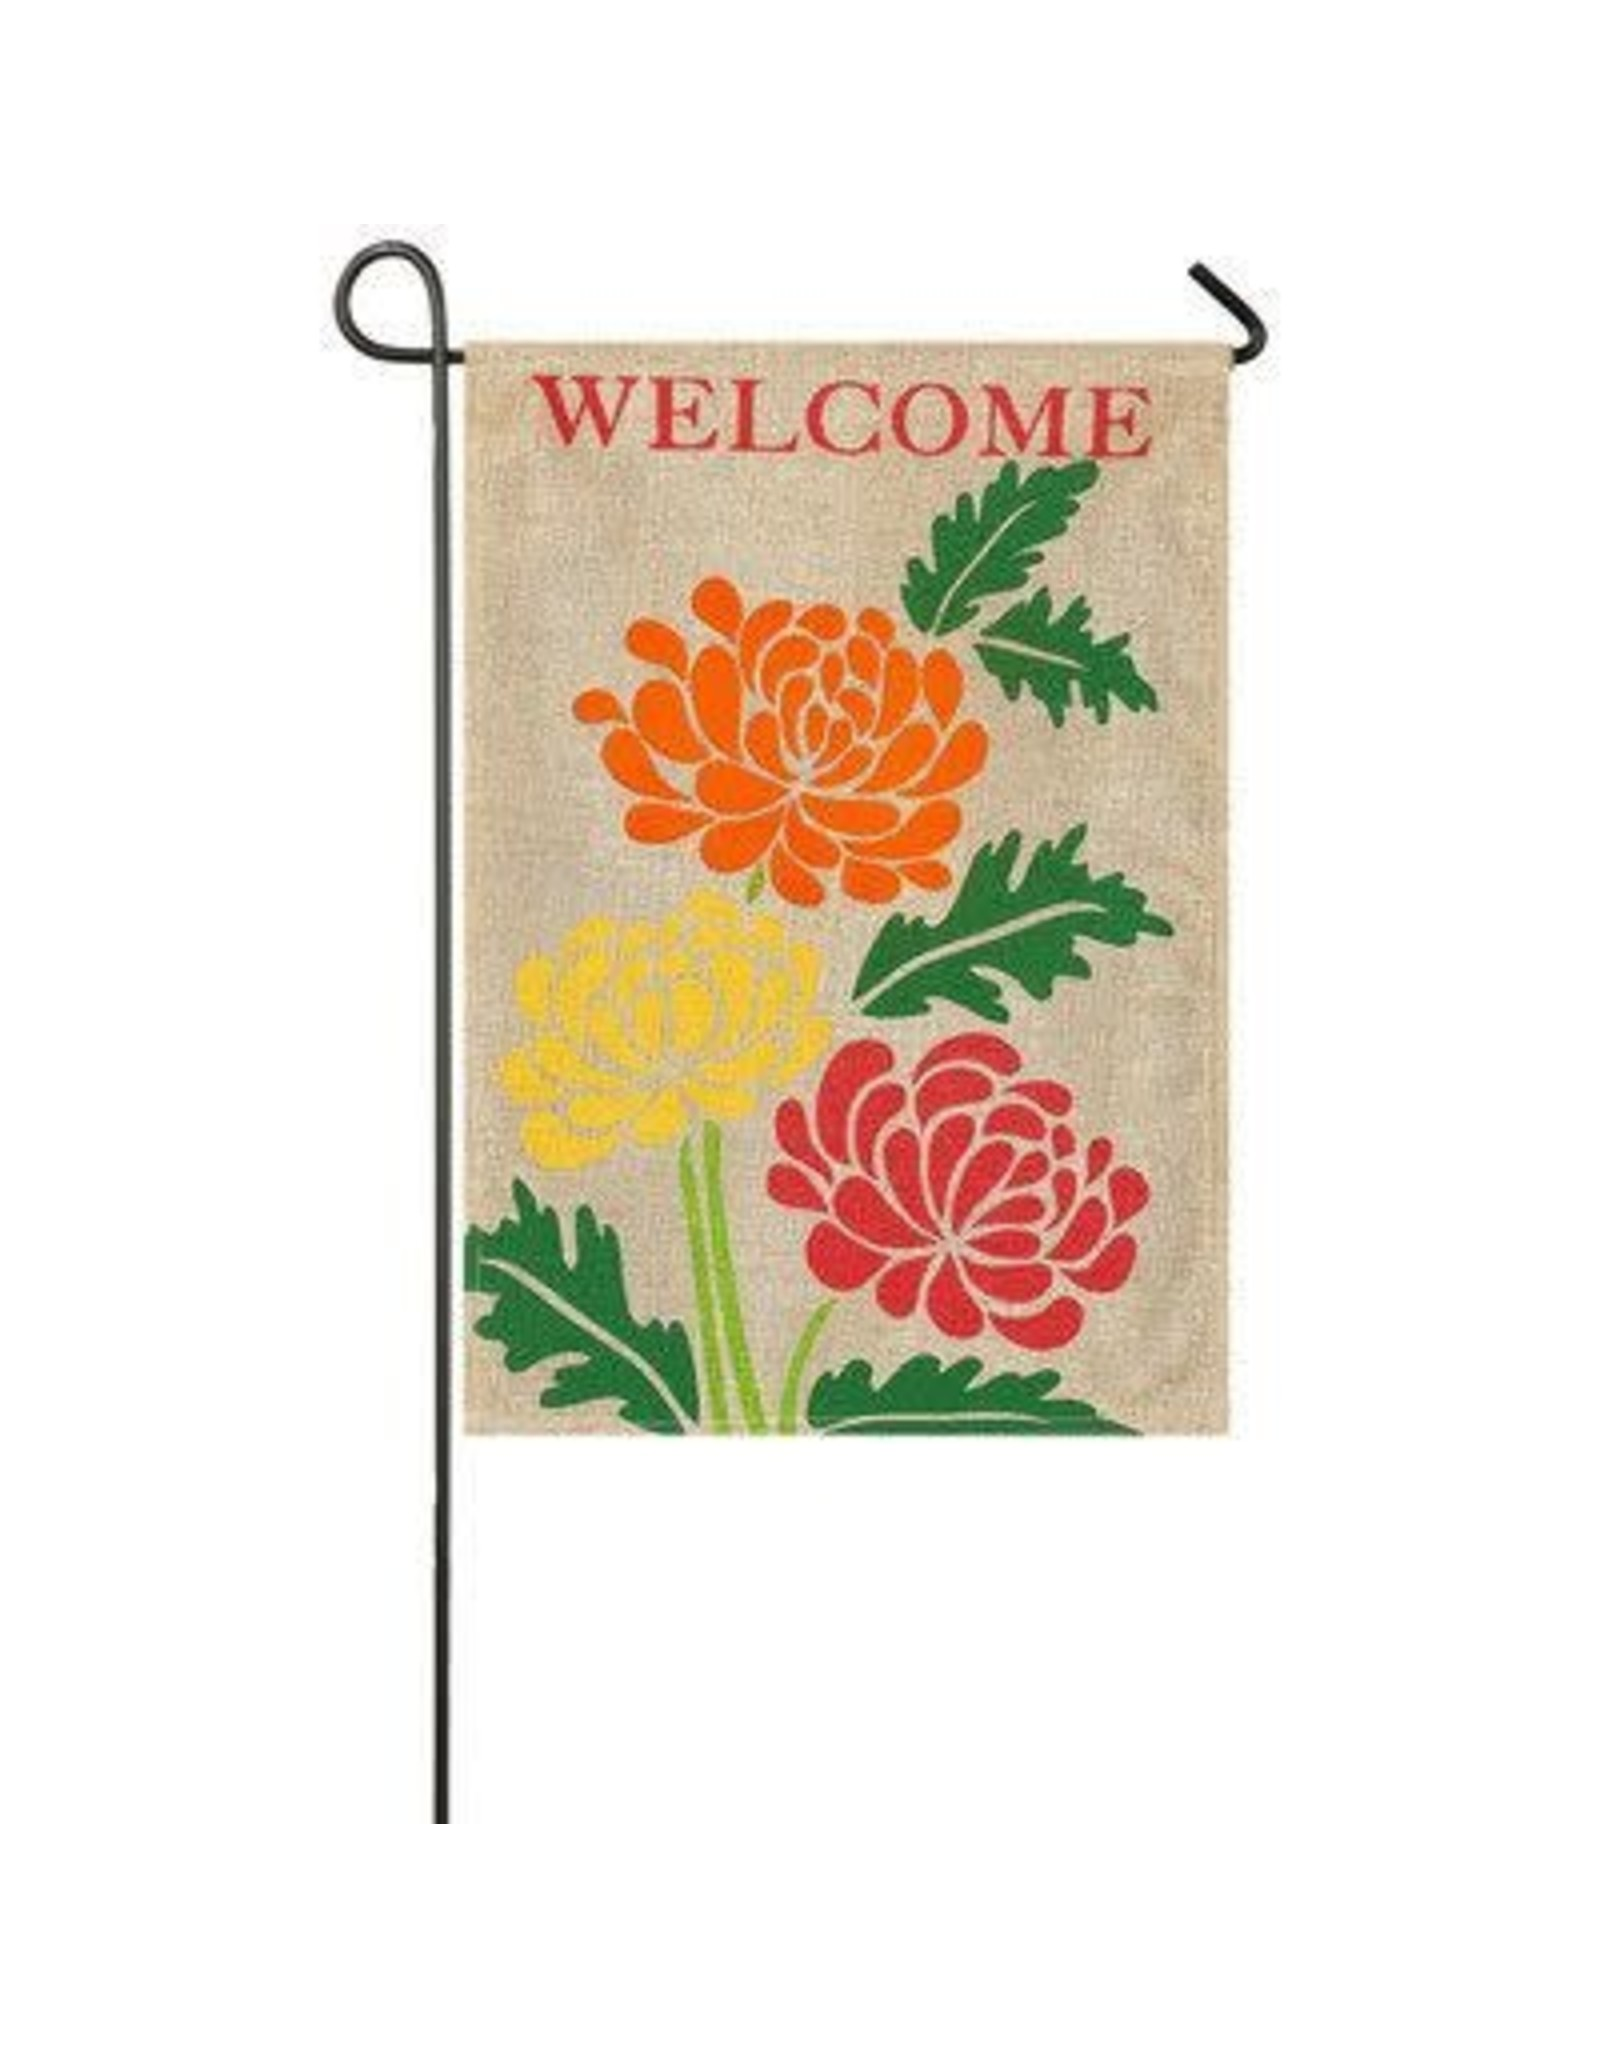 Evergreen Enterprises Fall Mums Garden Burlap Flag